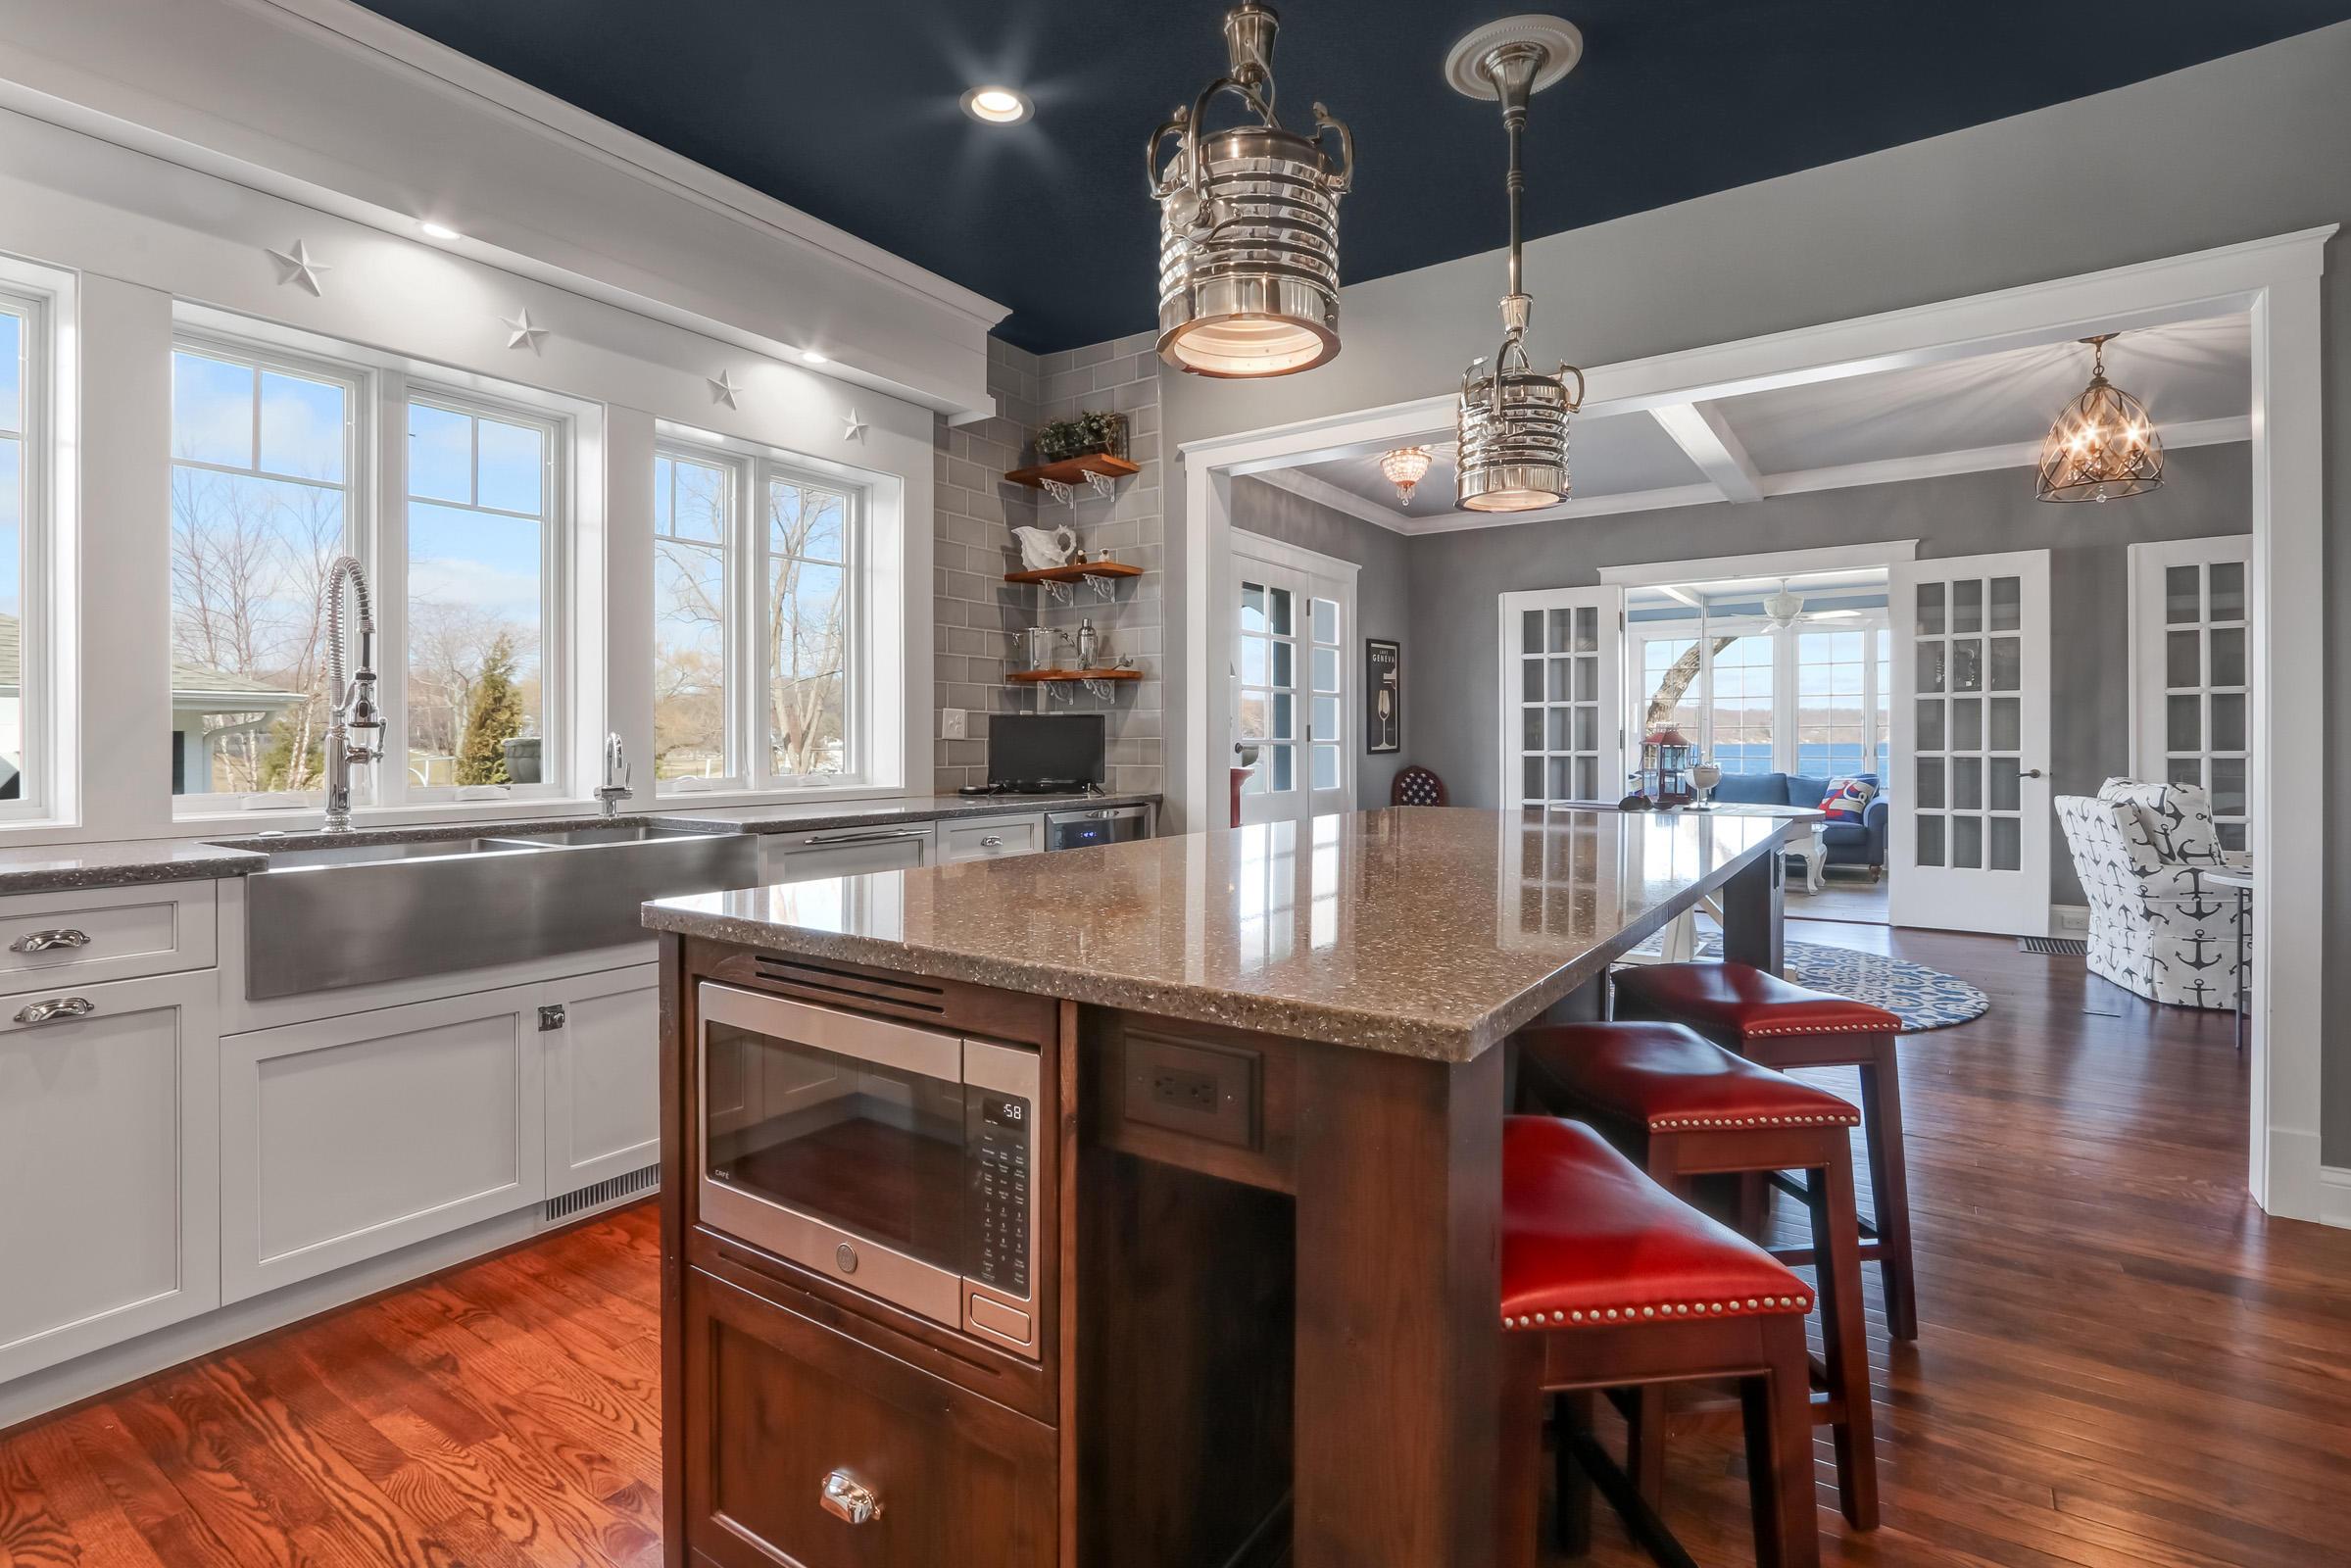 Kitchen with Spacious Island